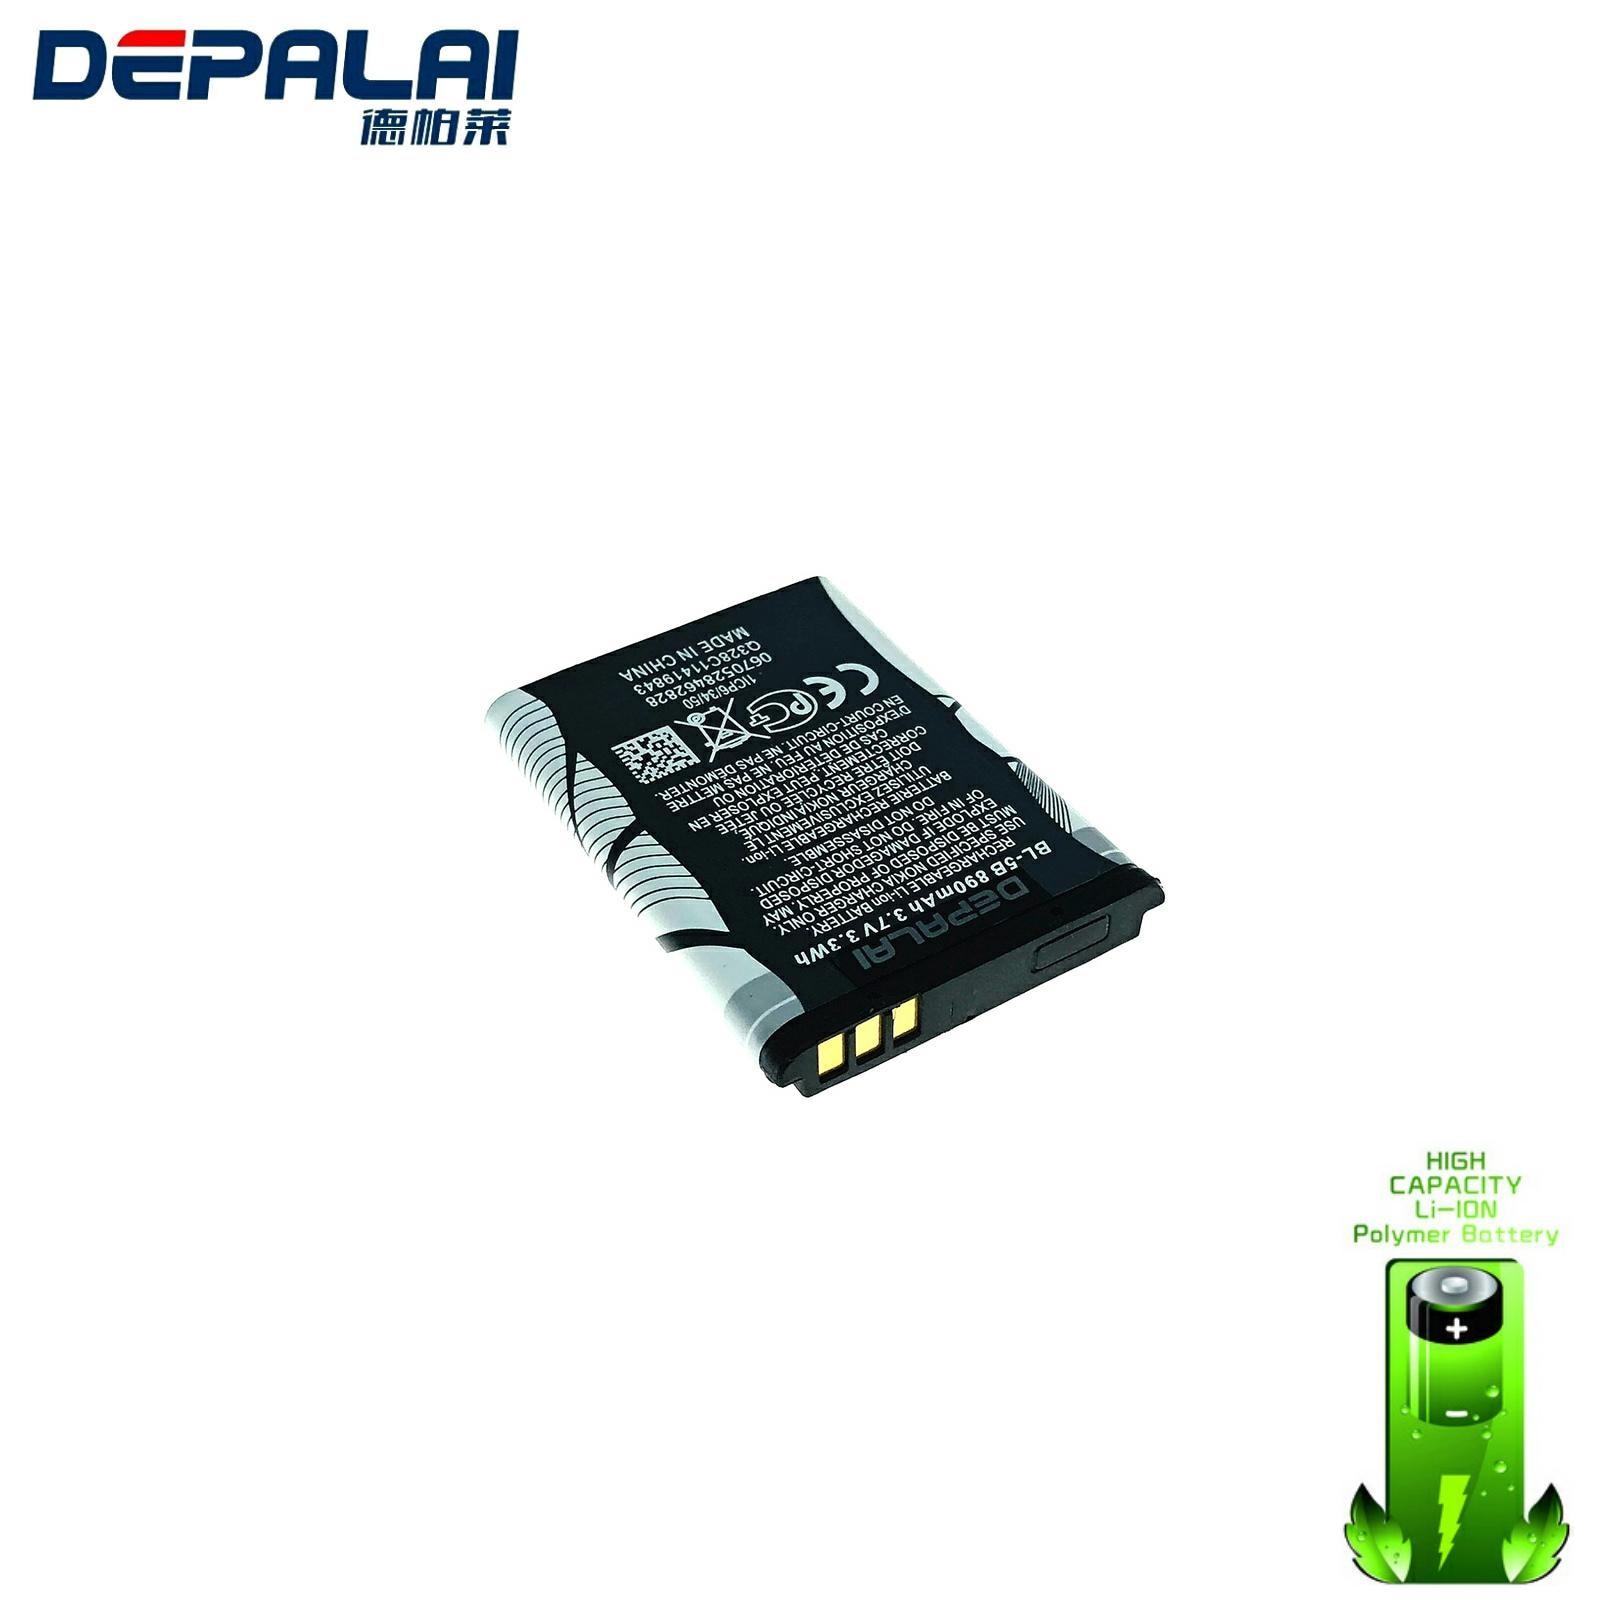 890mAh BL-5B Batterie pour Nokia 3230 5070 5140 5200 5300 5500 6020 6021 6060 6070 6080 6120 6120C 7260 7360 7620 N80 N90 BL-5B